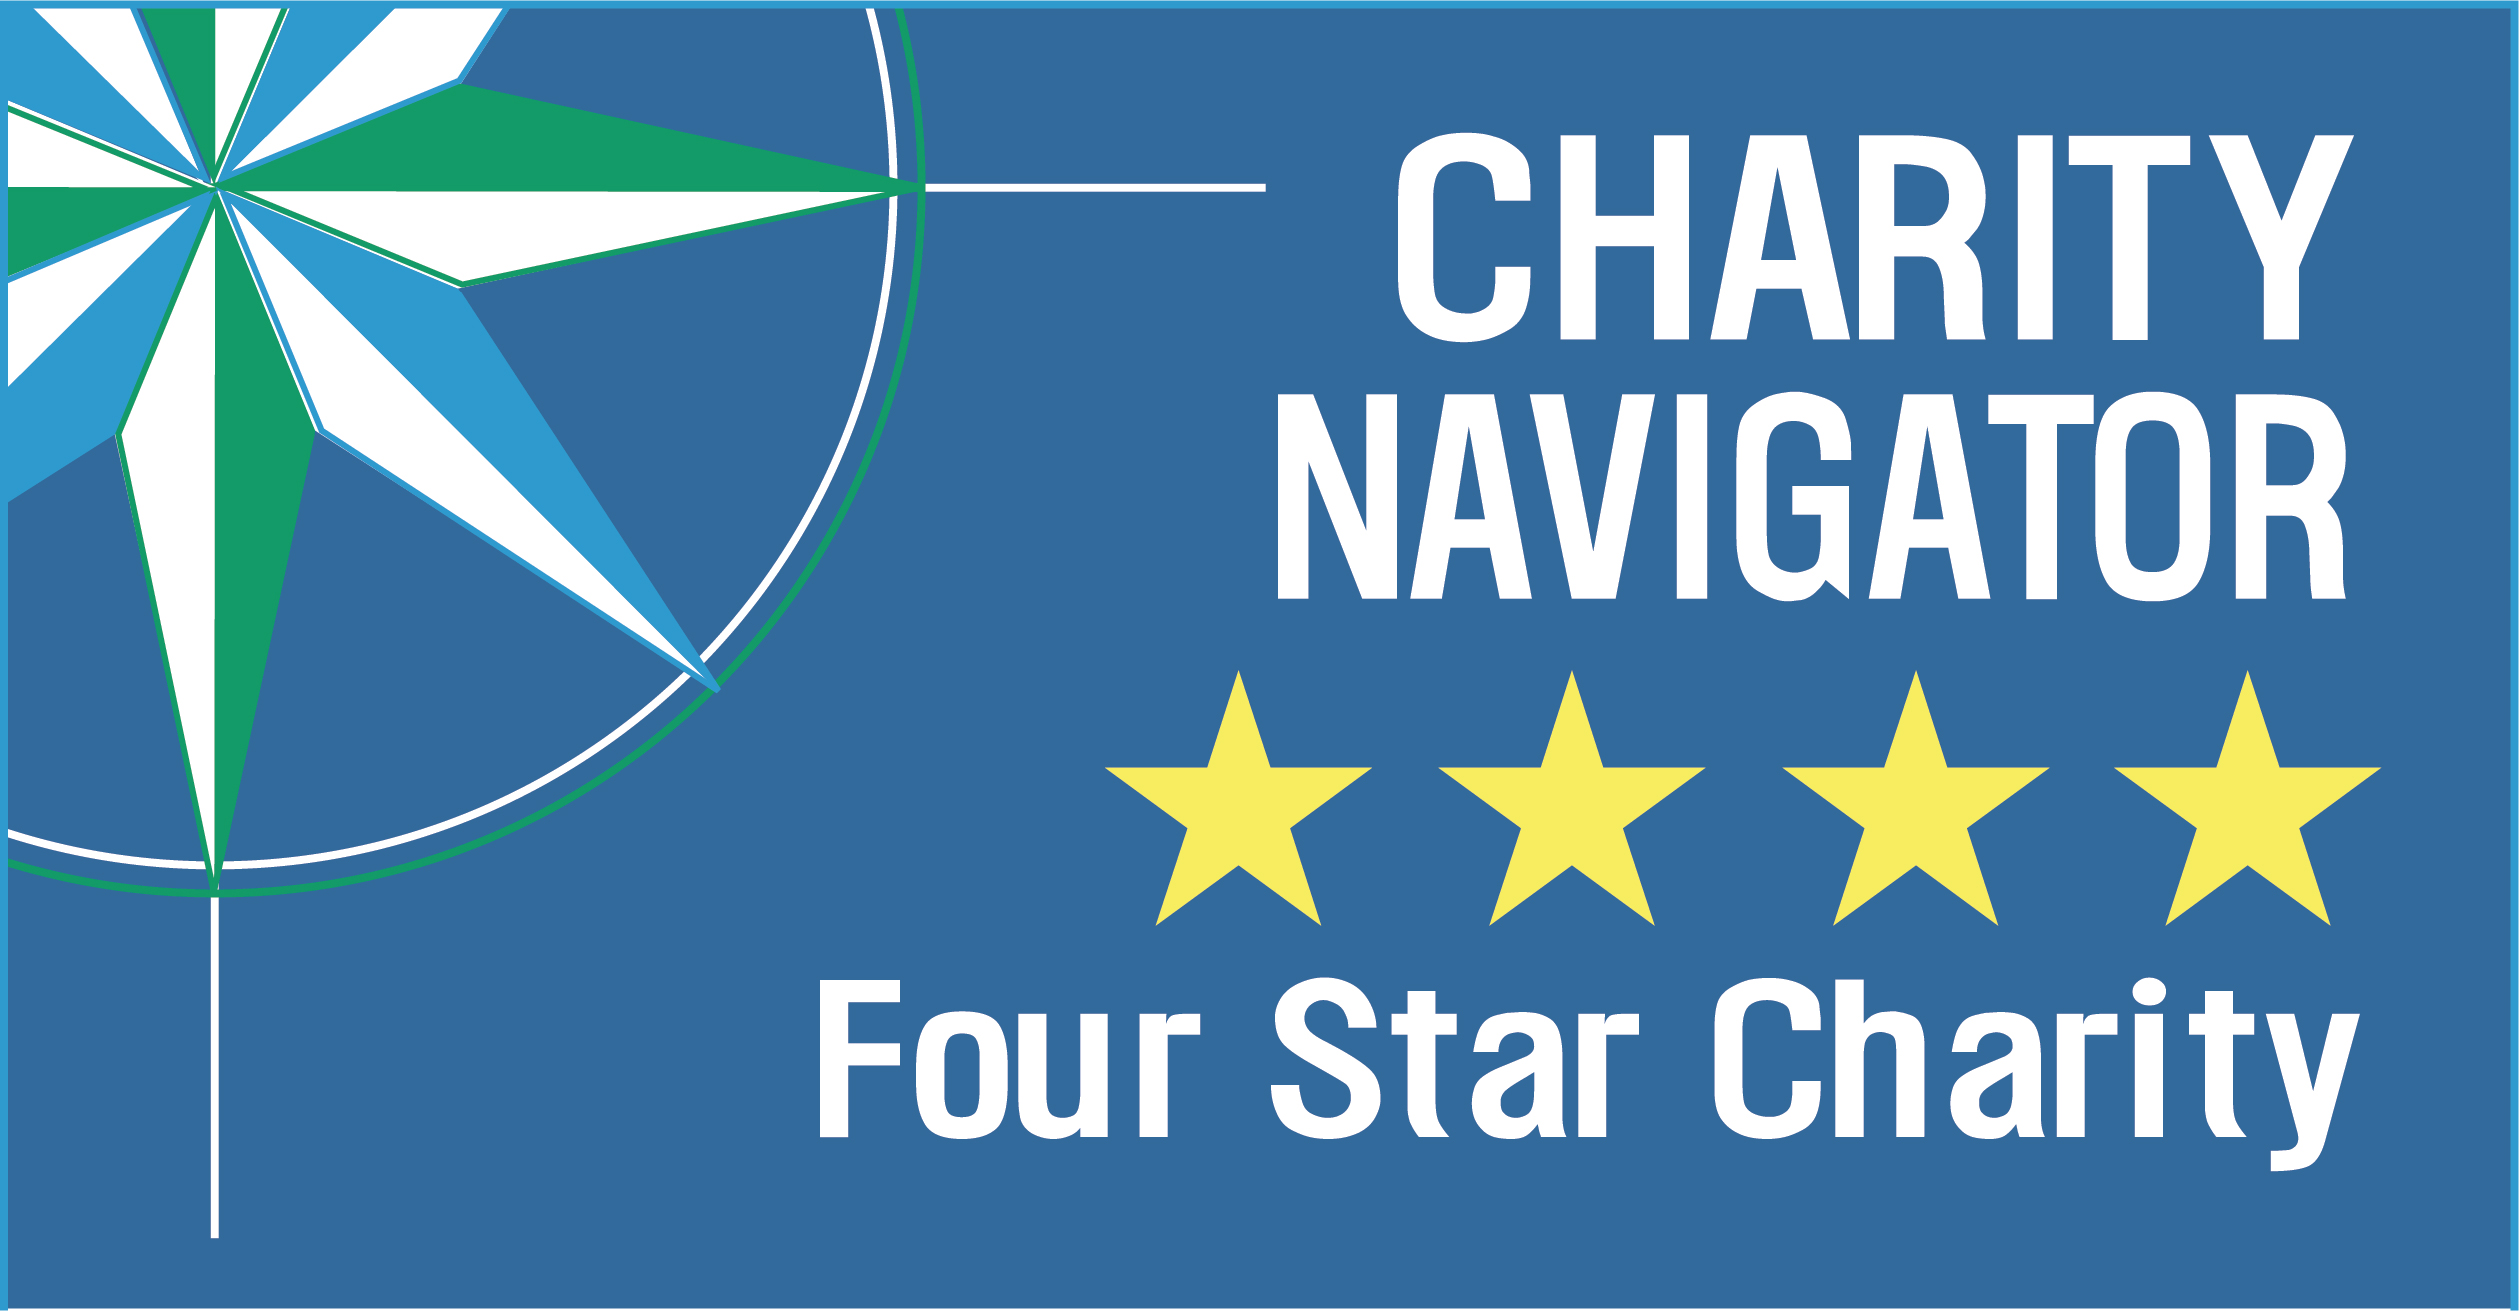 charitynavigatorlogo2.jpg